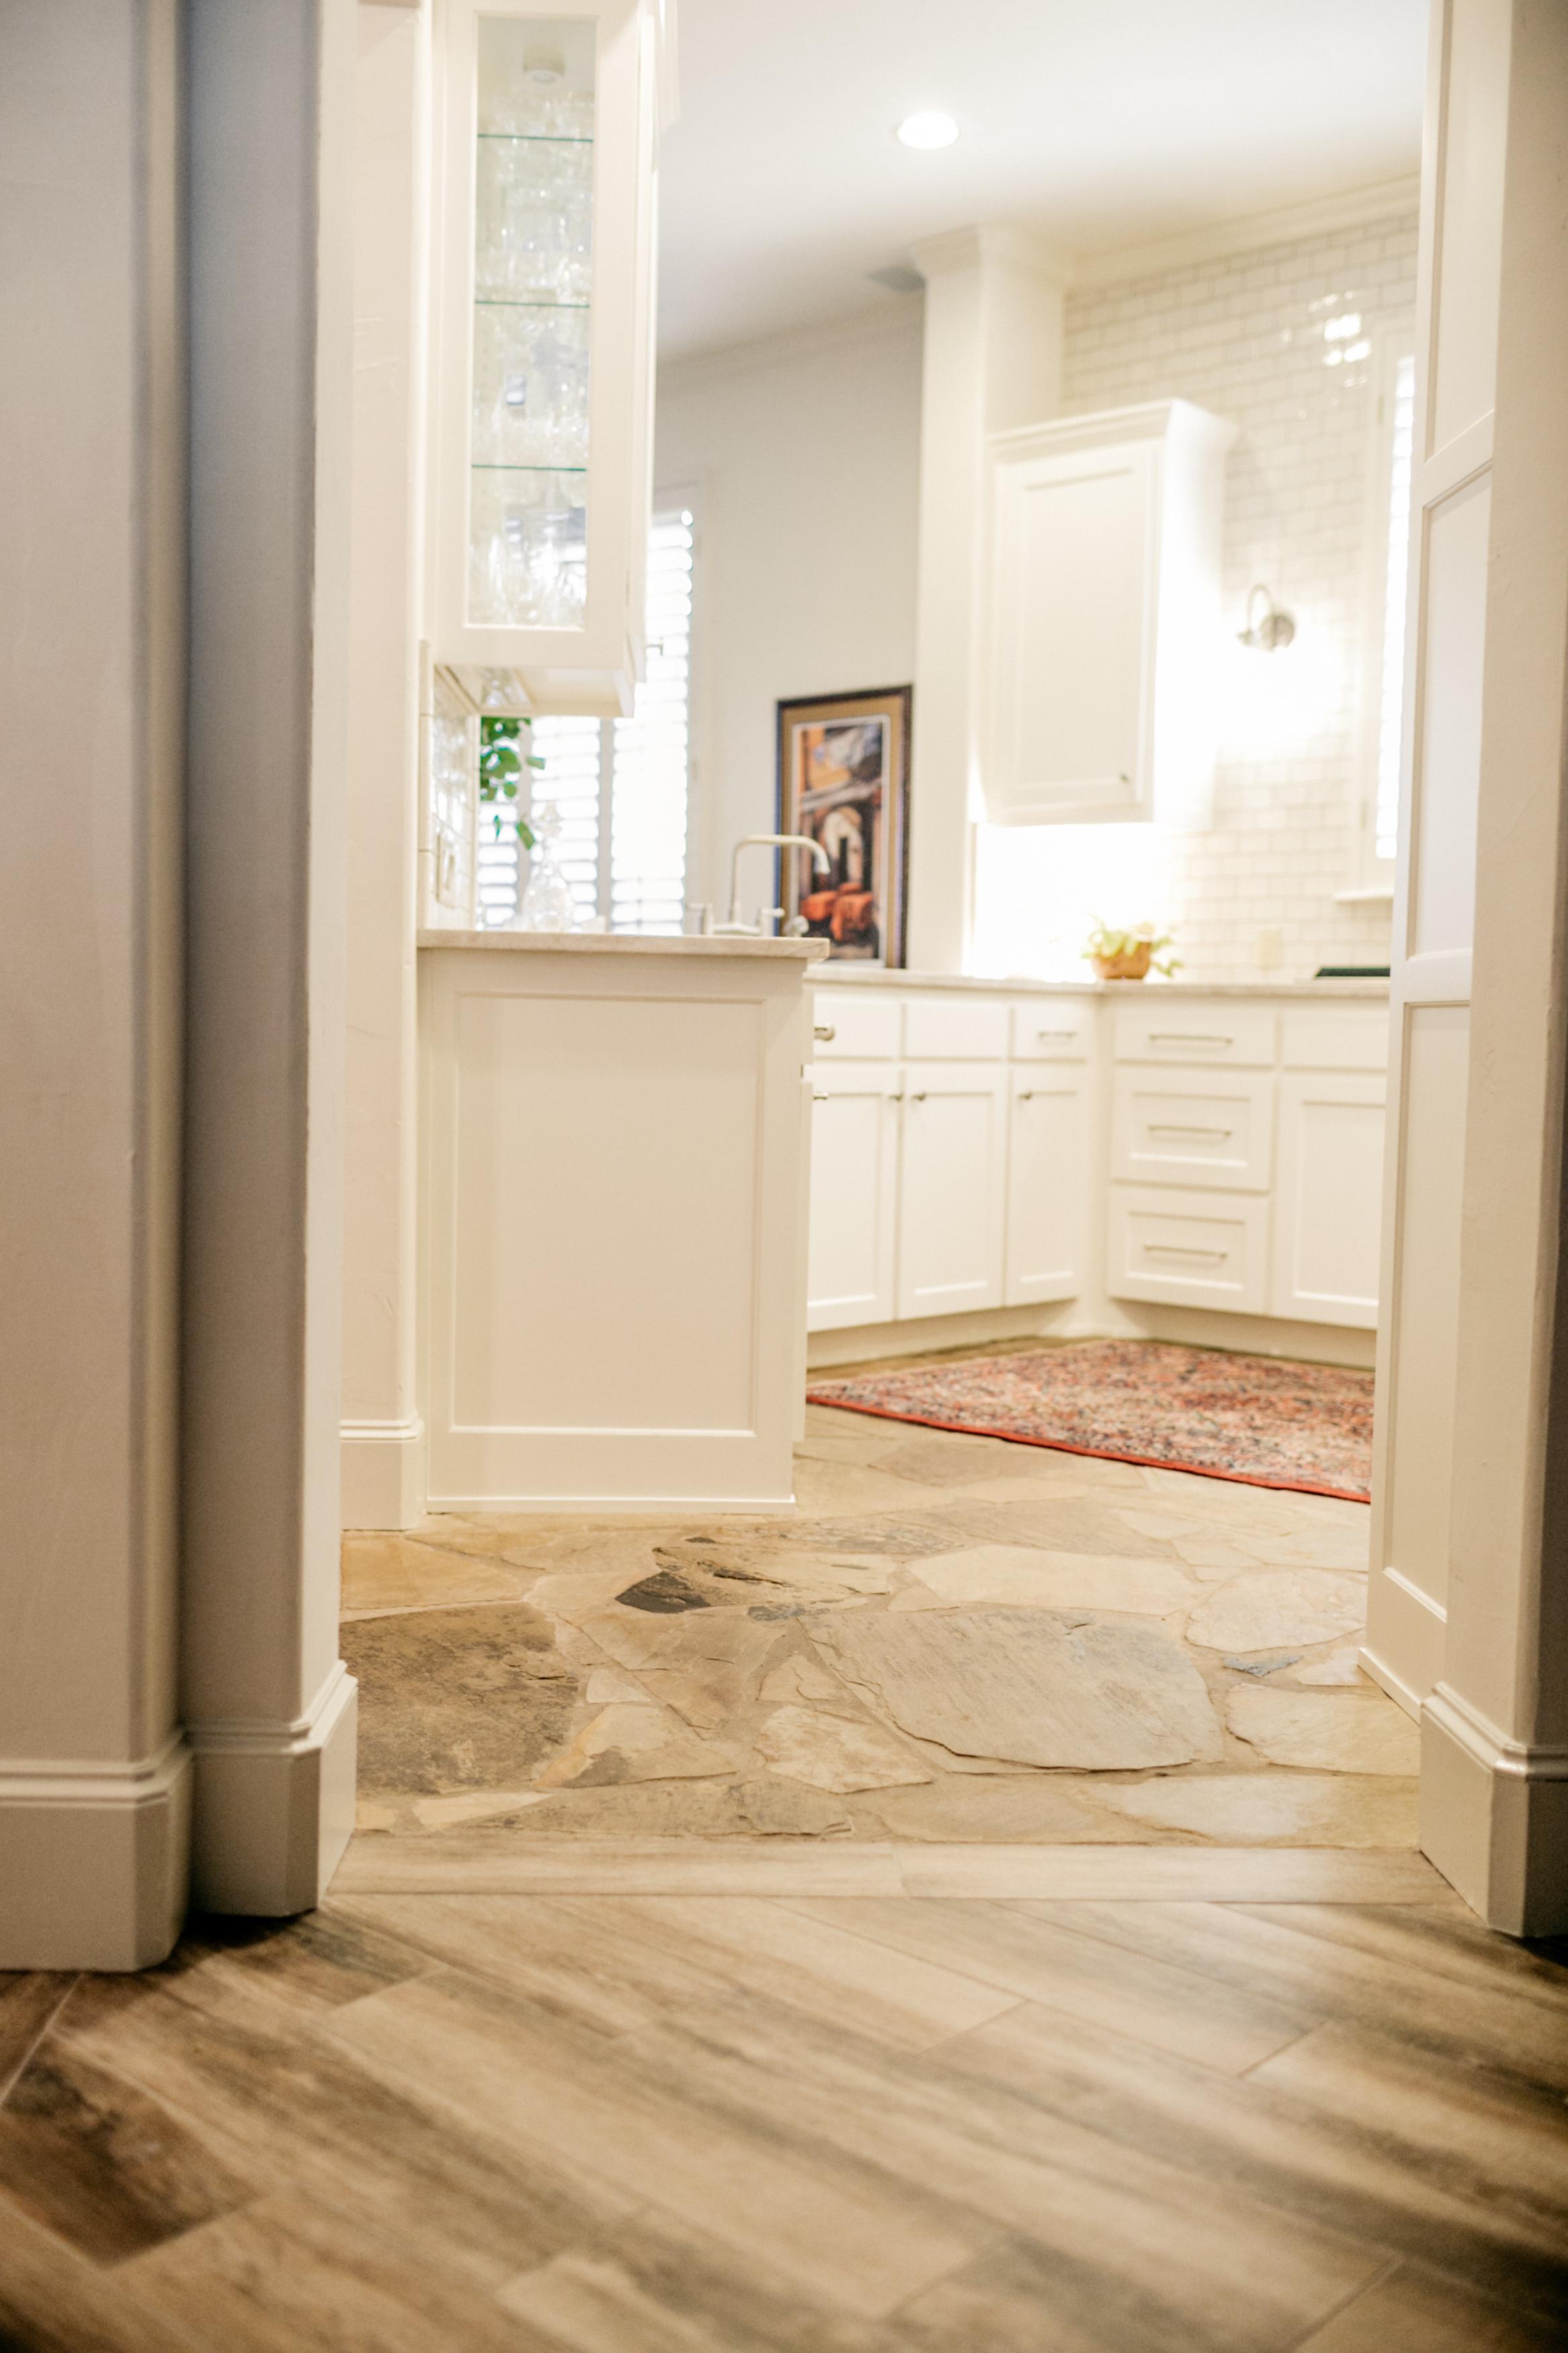 Kitchen Remodel and Interior Design